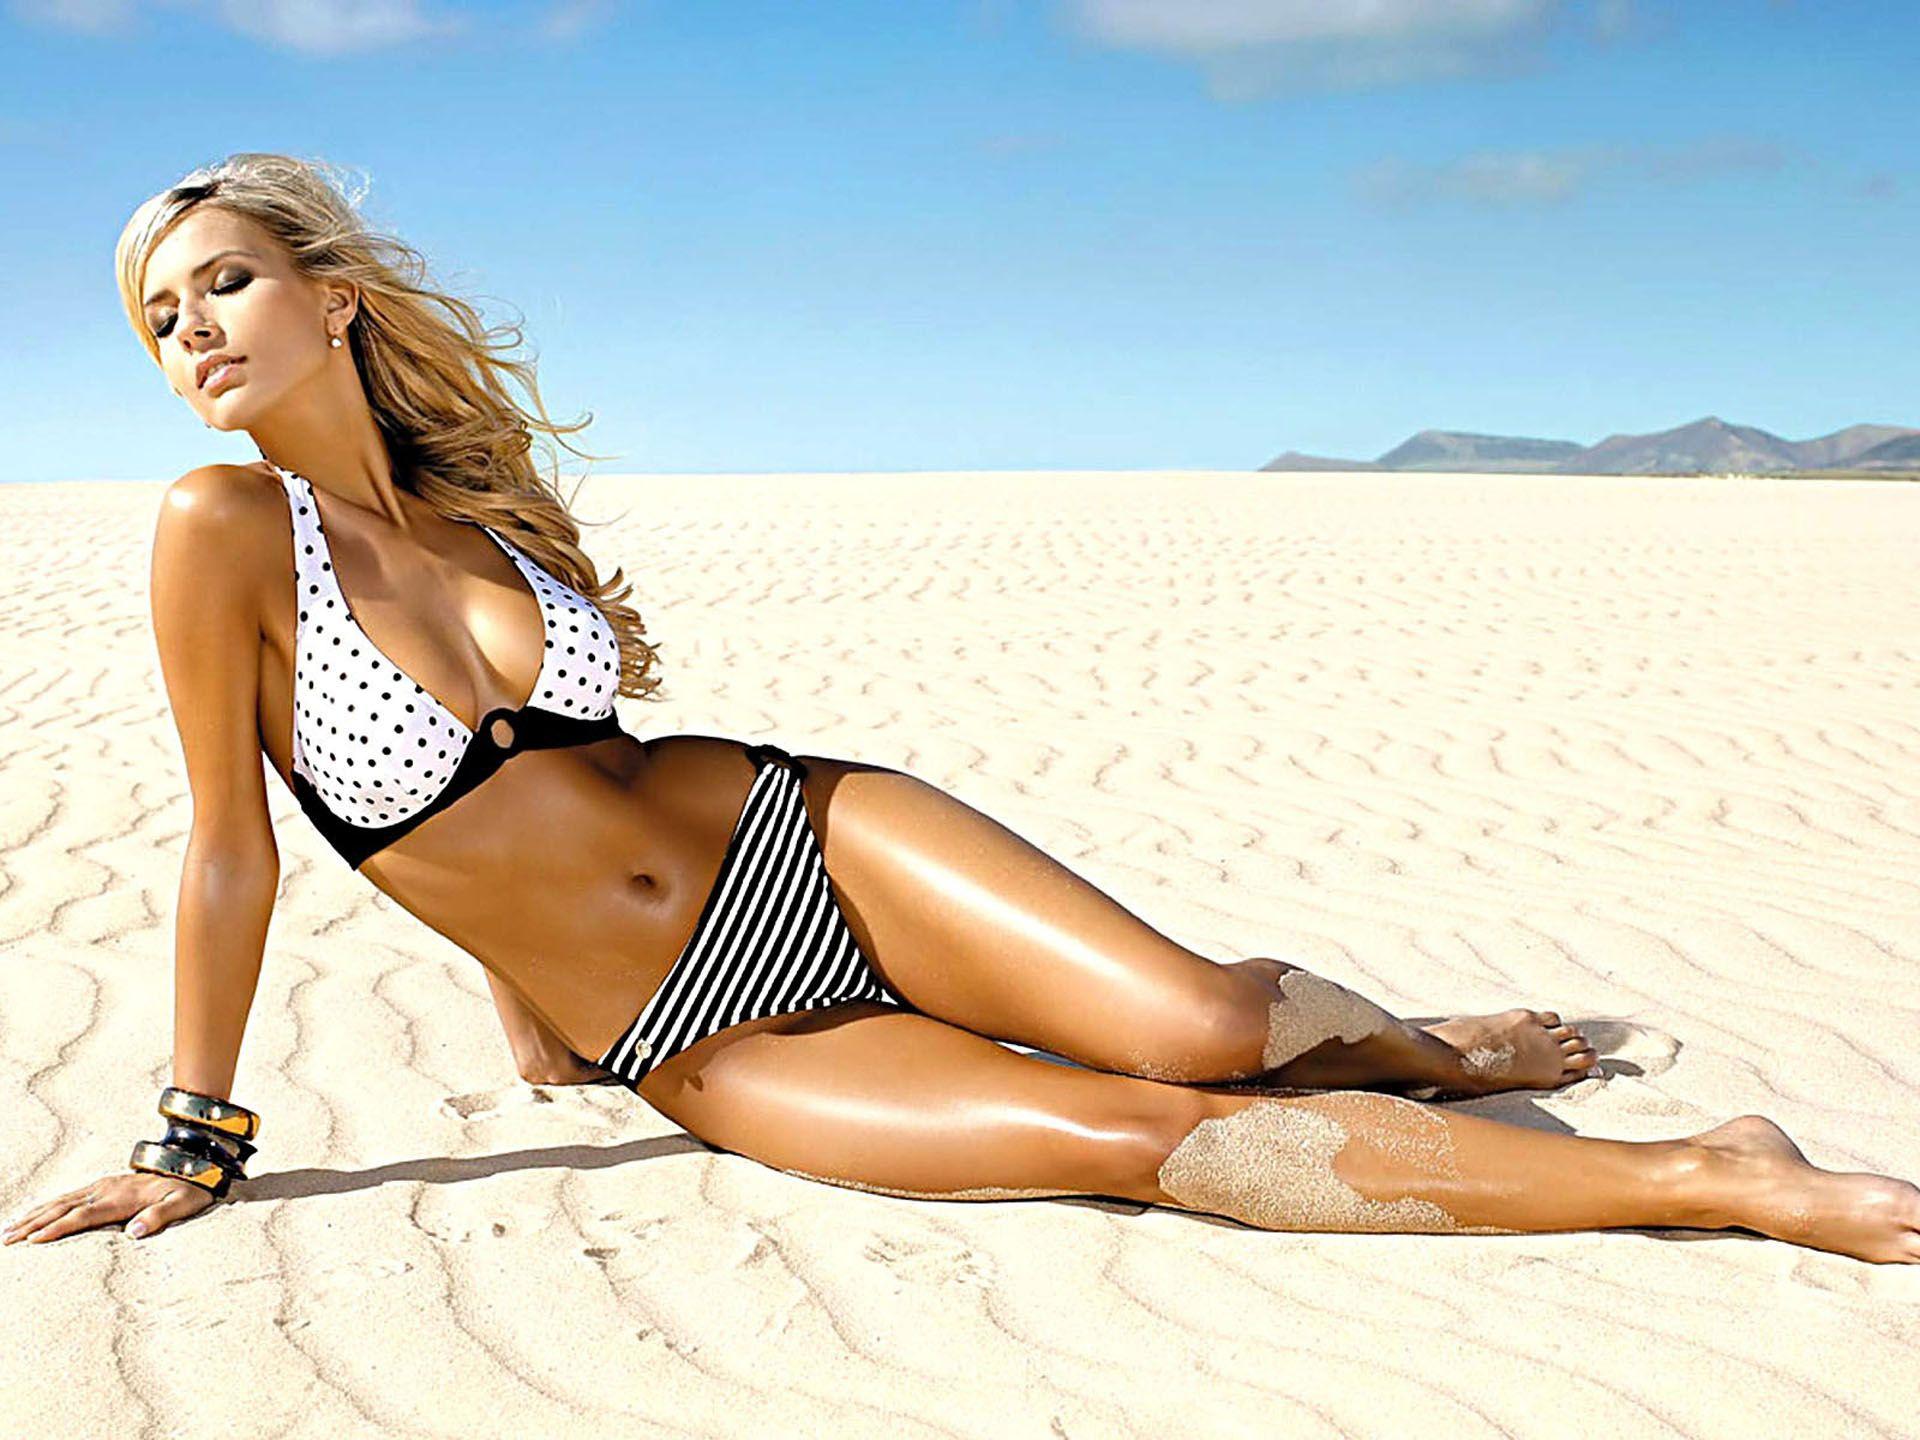 beach wear beach dresses, beachwear, beachwear clothing, beachwear clothing  men, beachwear dresses hzxtnwt